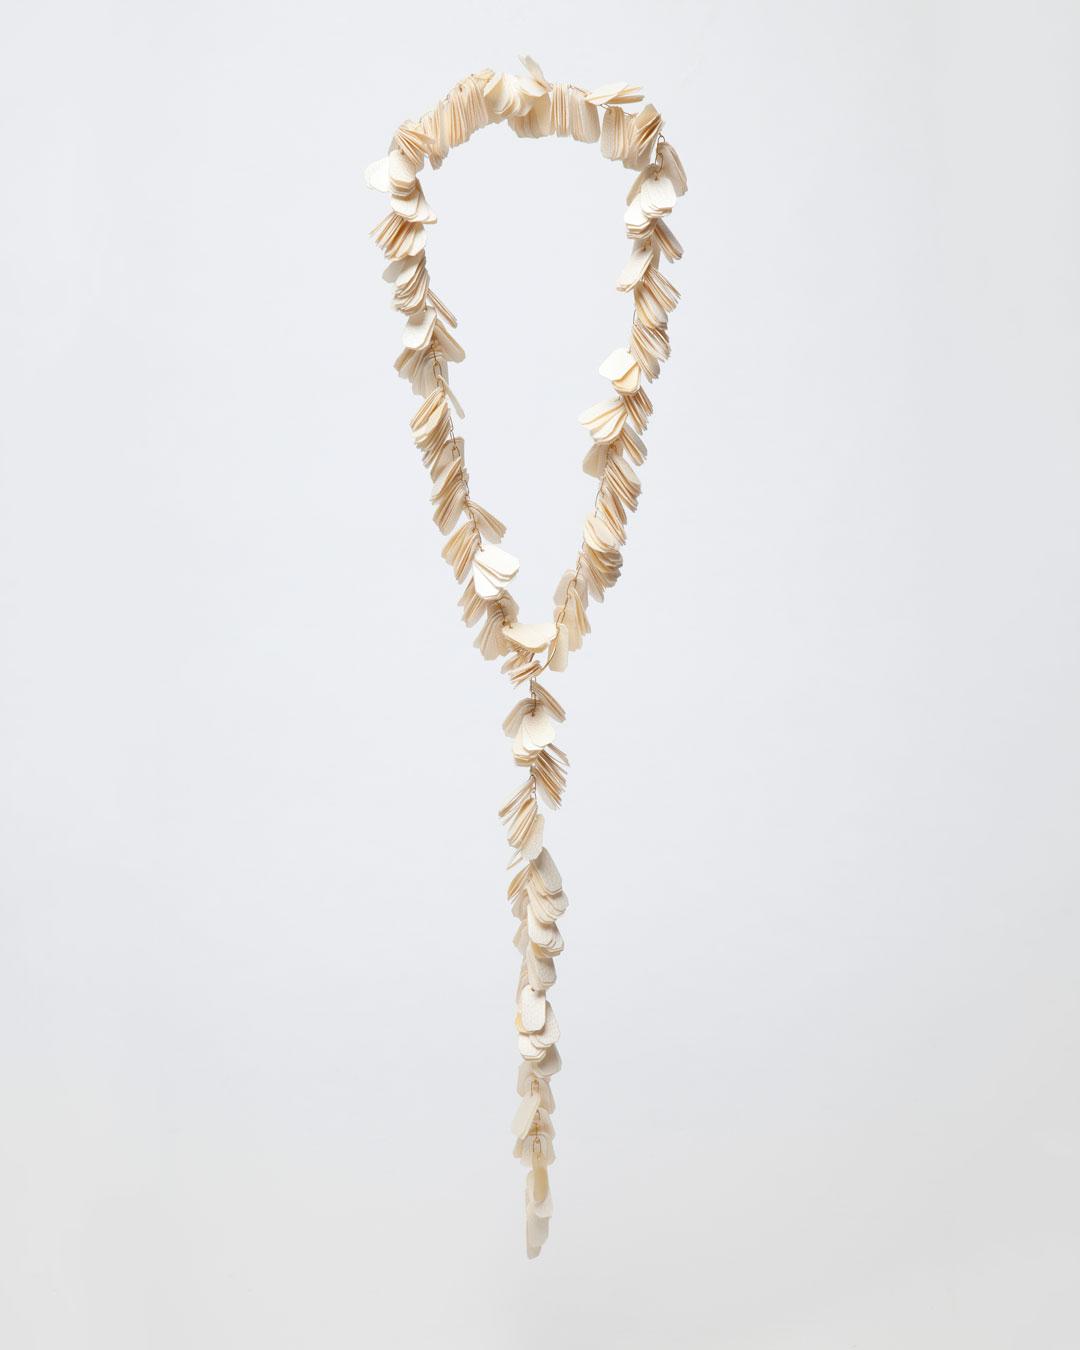 Annamaria Leiste, Vor-Zunamen (First Name-Last Name), 2017, necklace; parchment, gold, 390 x 110 x 15 mm, €1950